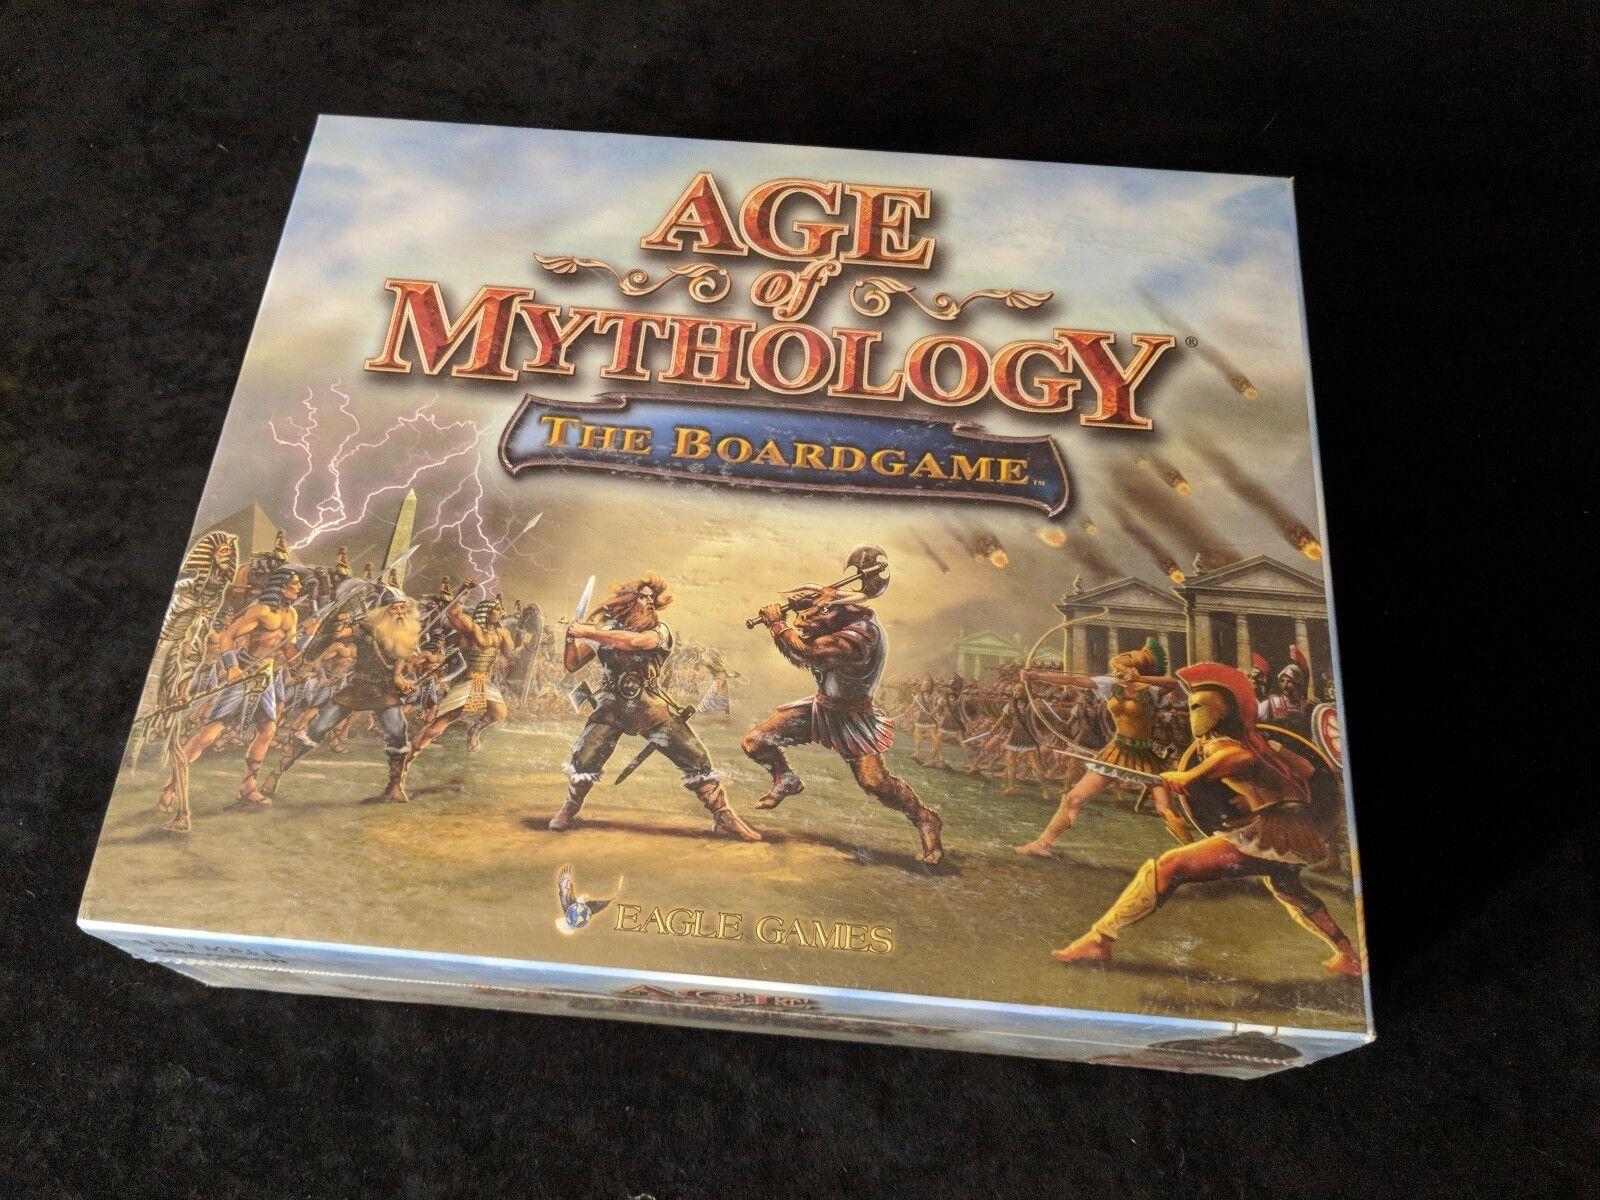 Age of Mythology Jeu de plateau mettant